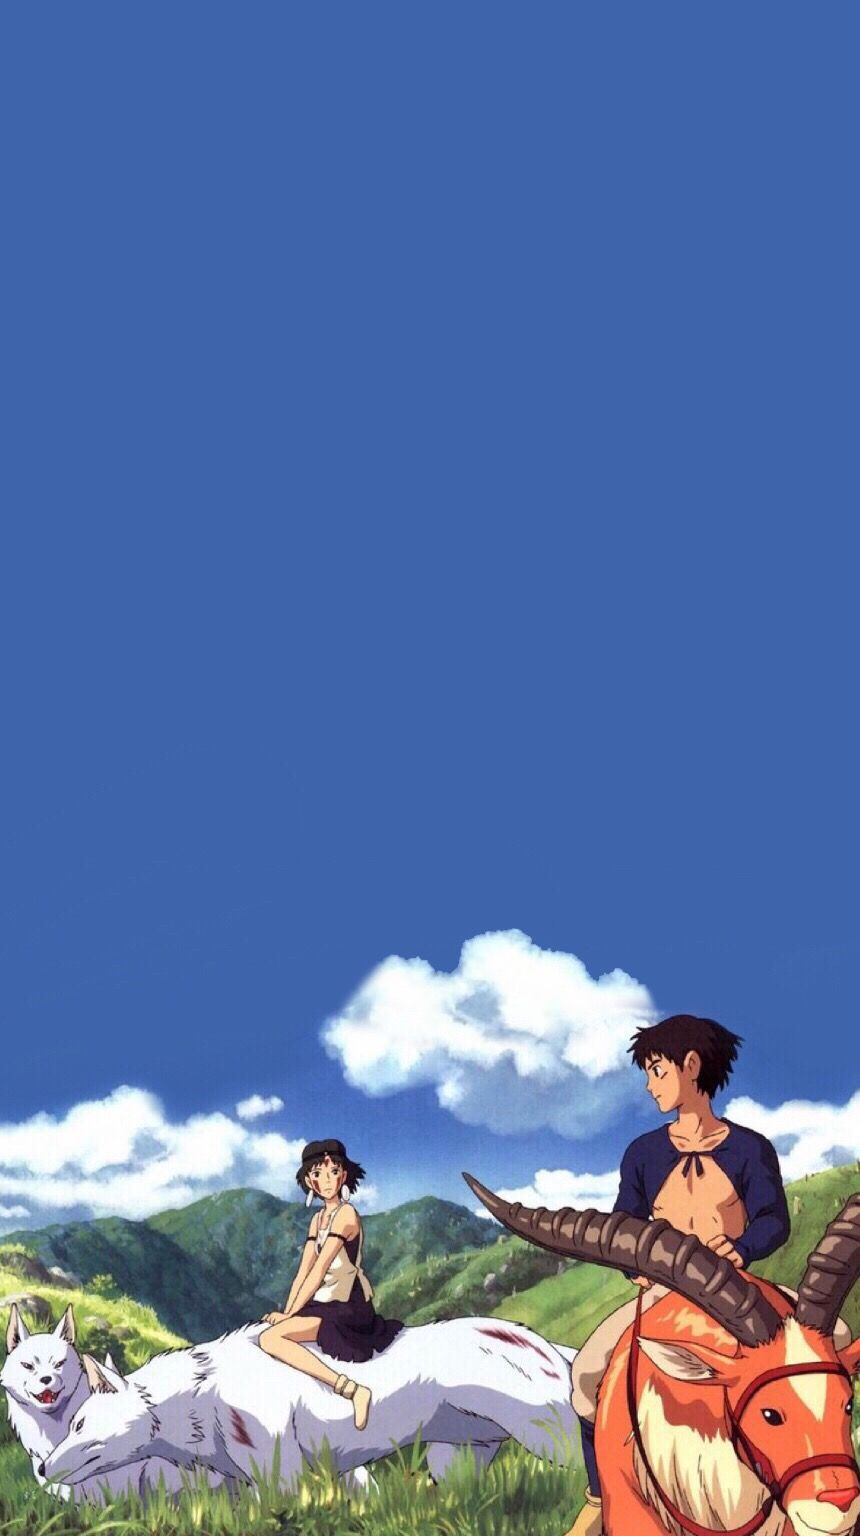 Get Easy Anime Wallpaper Iphone 7 Plus In 2020 Ghibli Artwork Studio Ghibli Background Anime Wallpaper Iphone